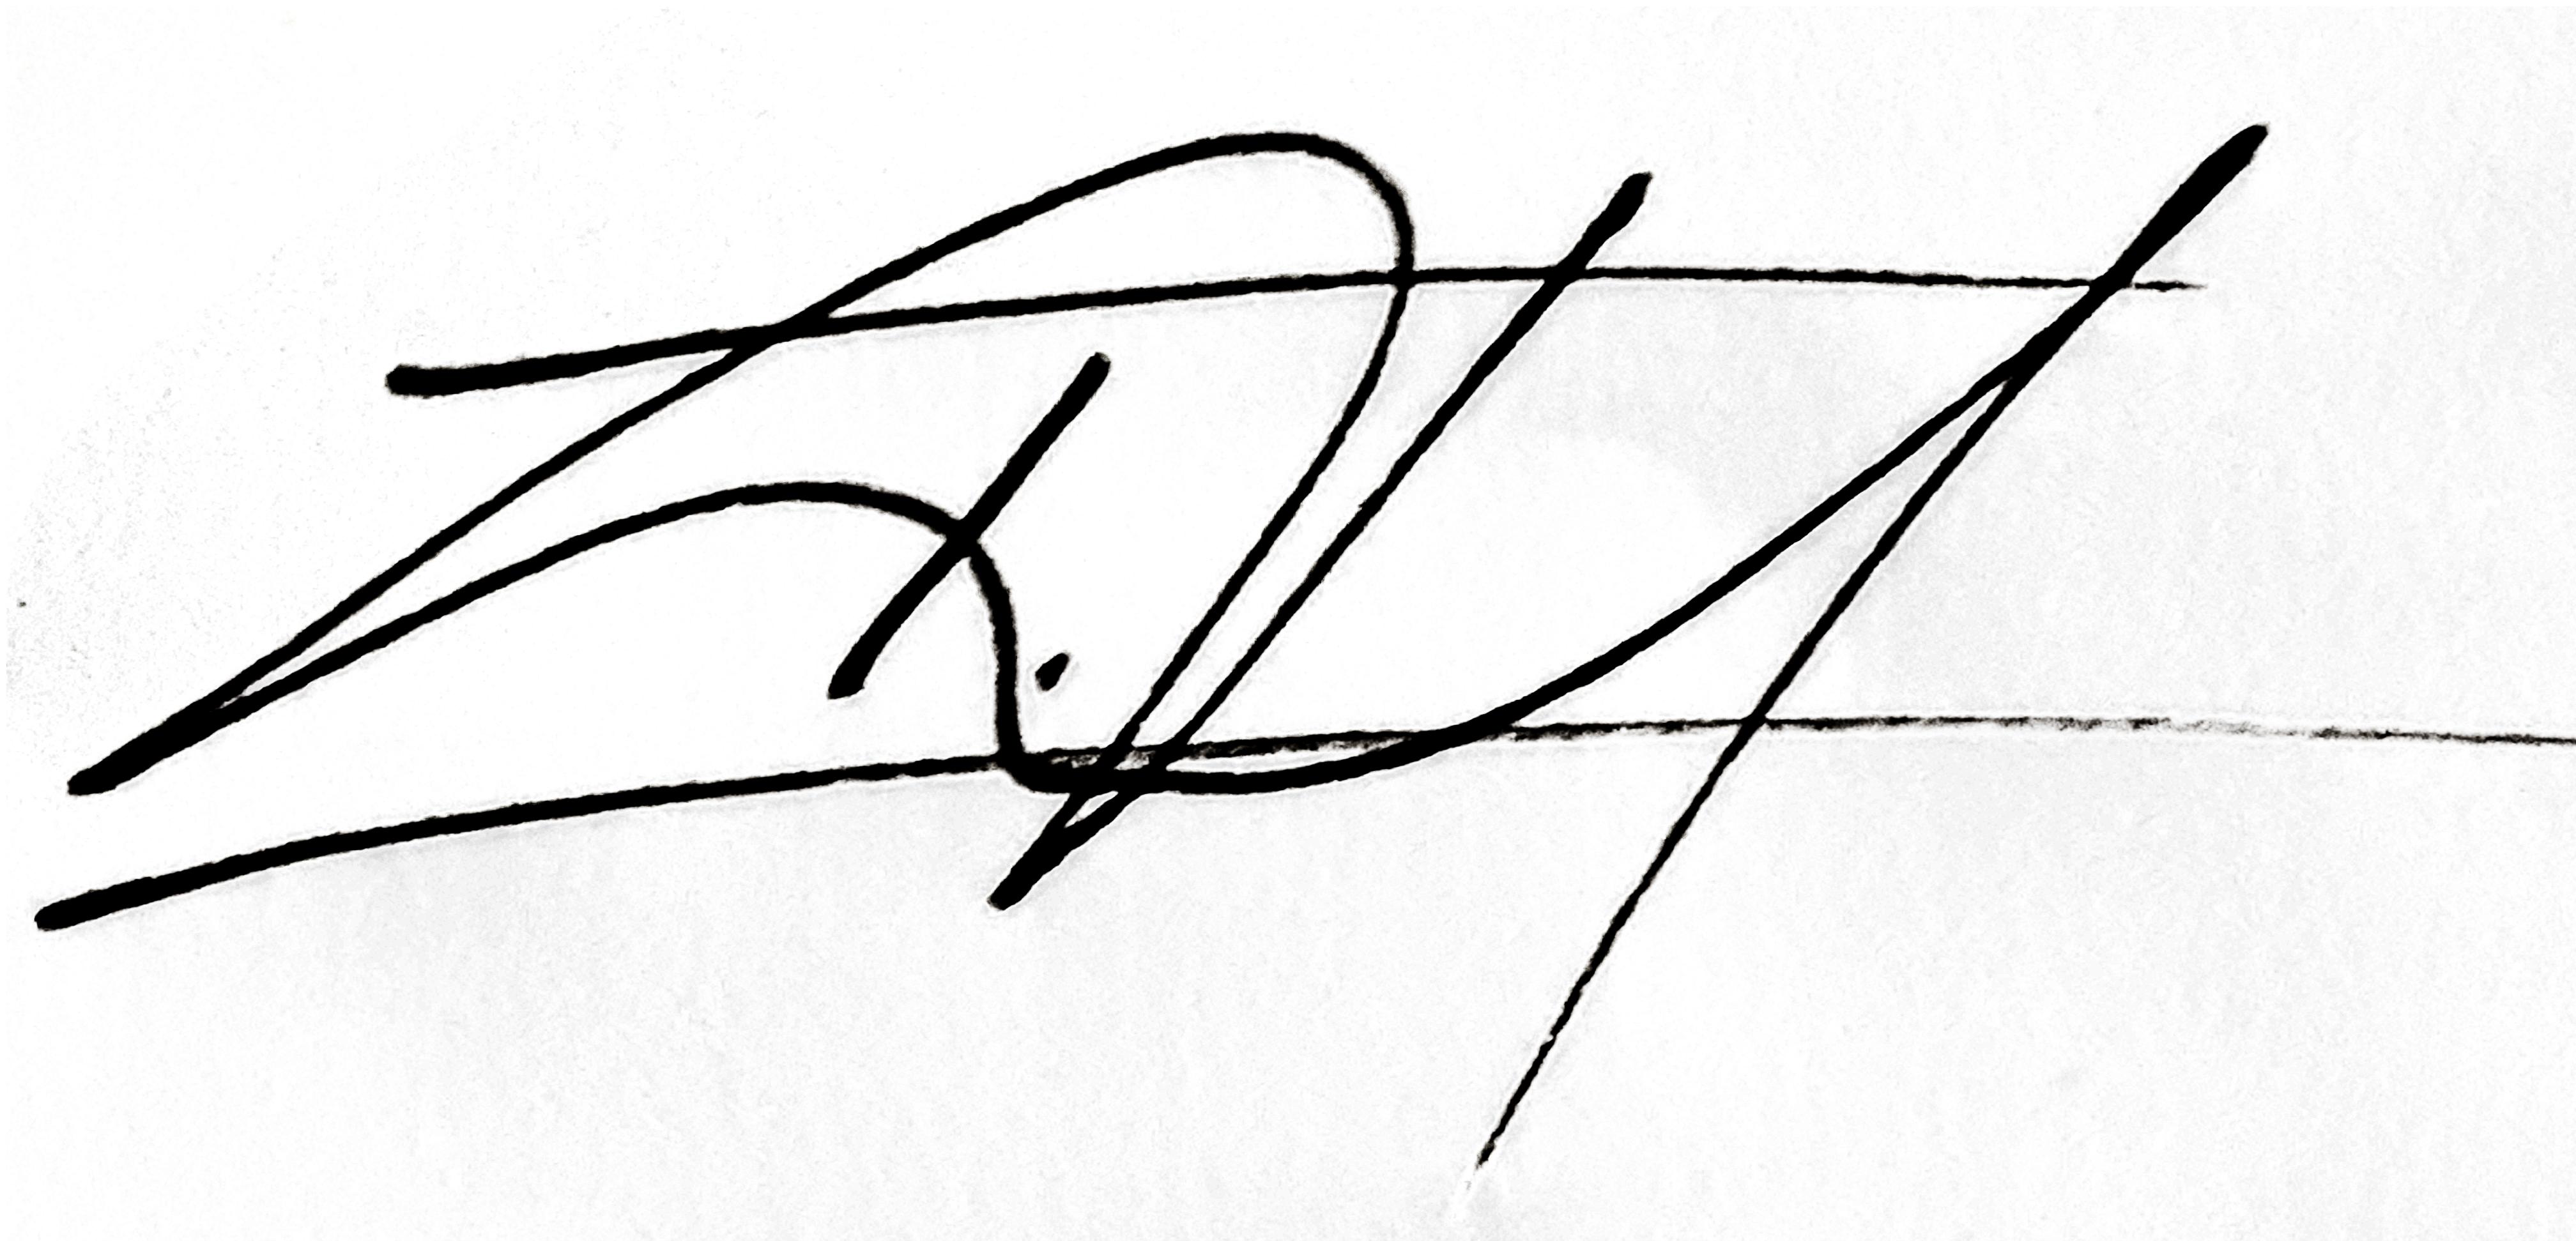 IZZY KAY's Signature